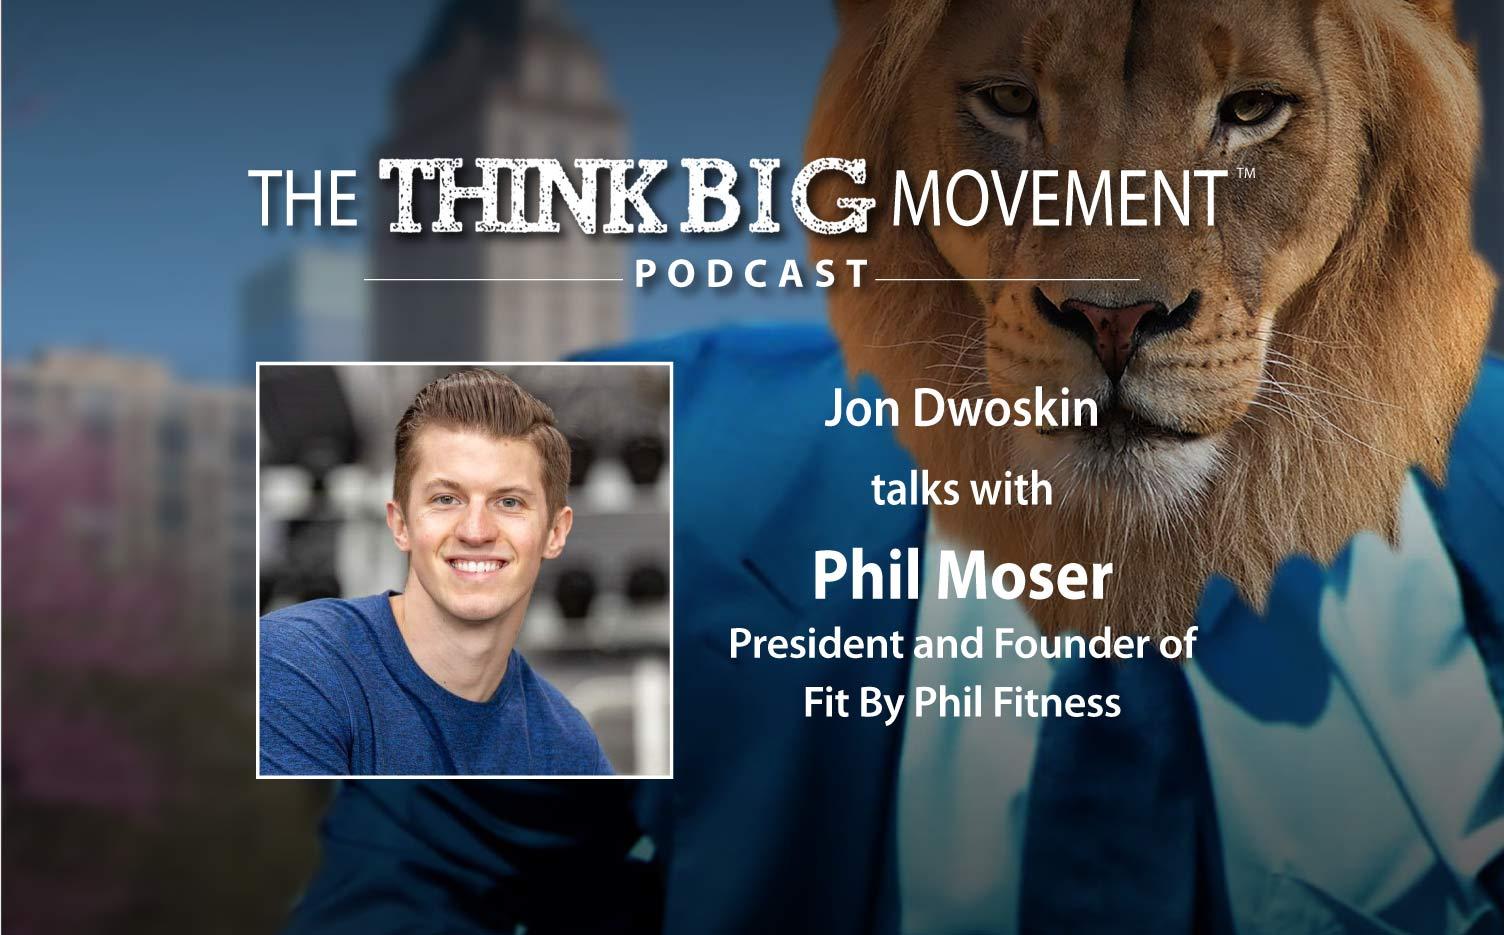 Jon Dwoskin Interviews Phil Moser